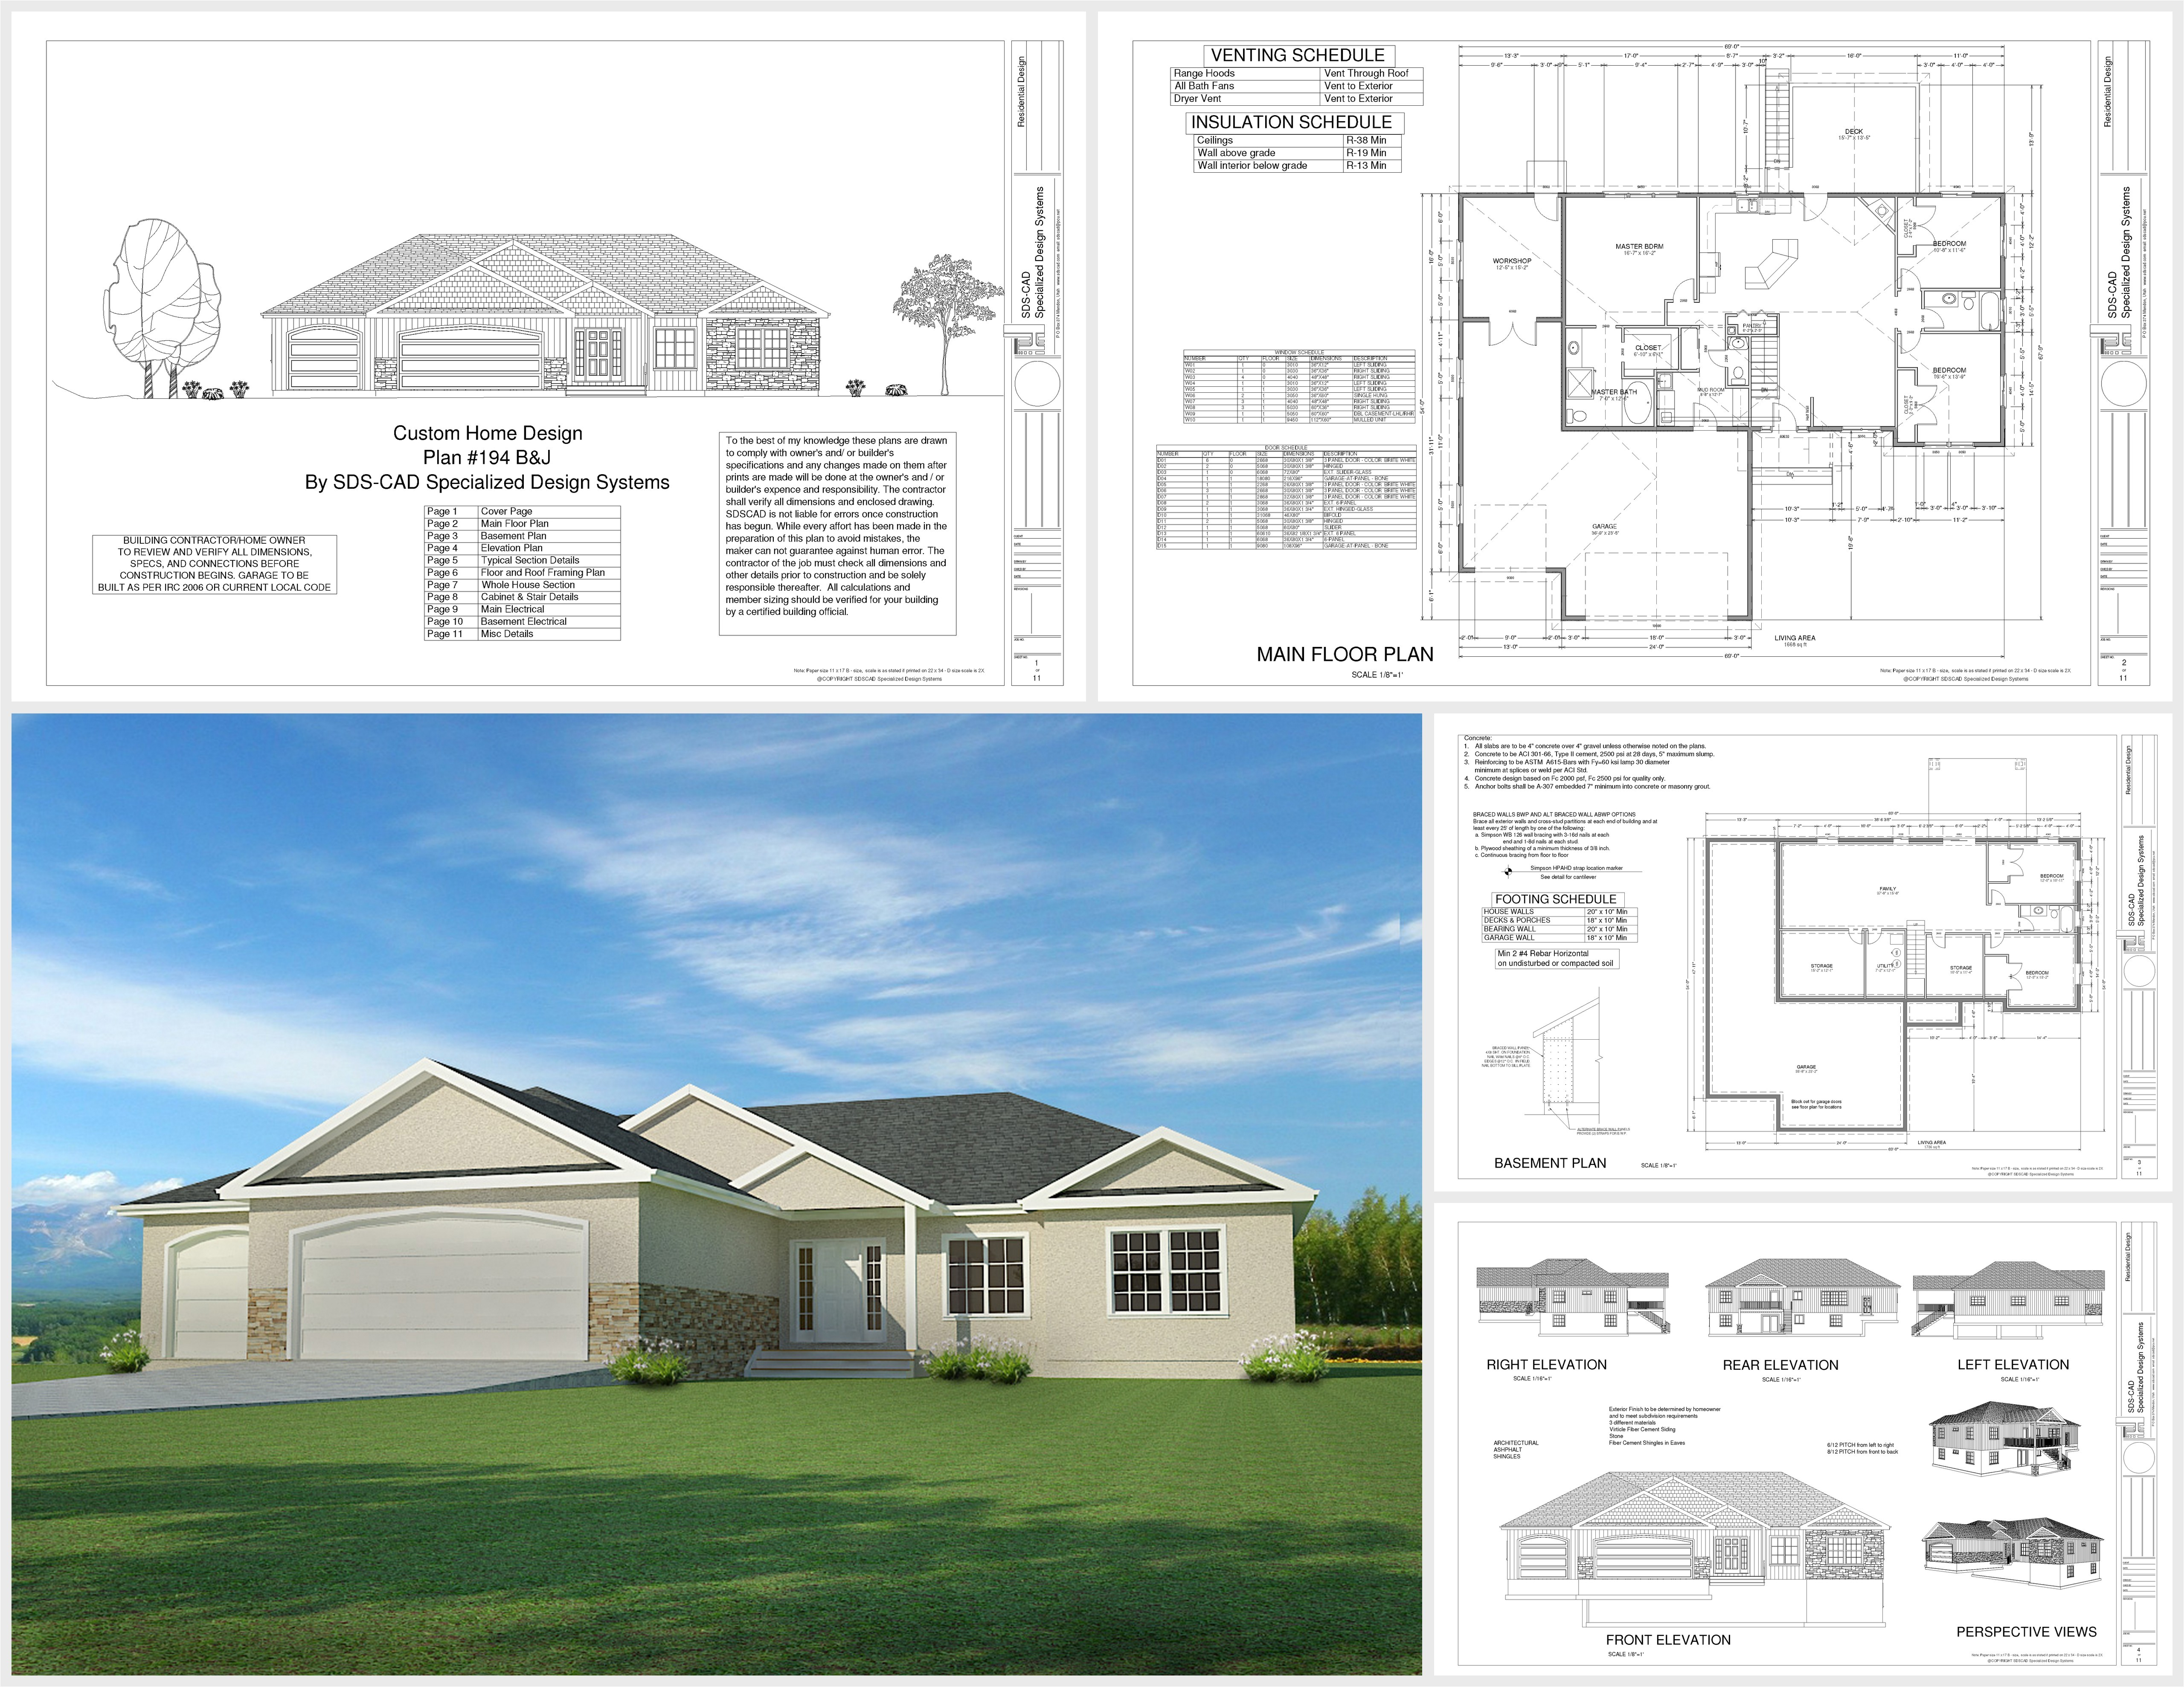 download this weeks free house plan h194 1668 sq ft 3 bdm 2 bath